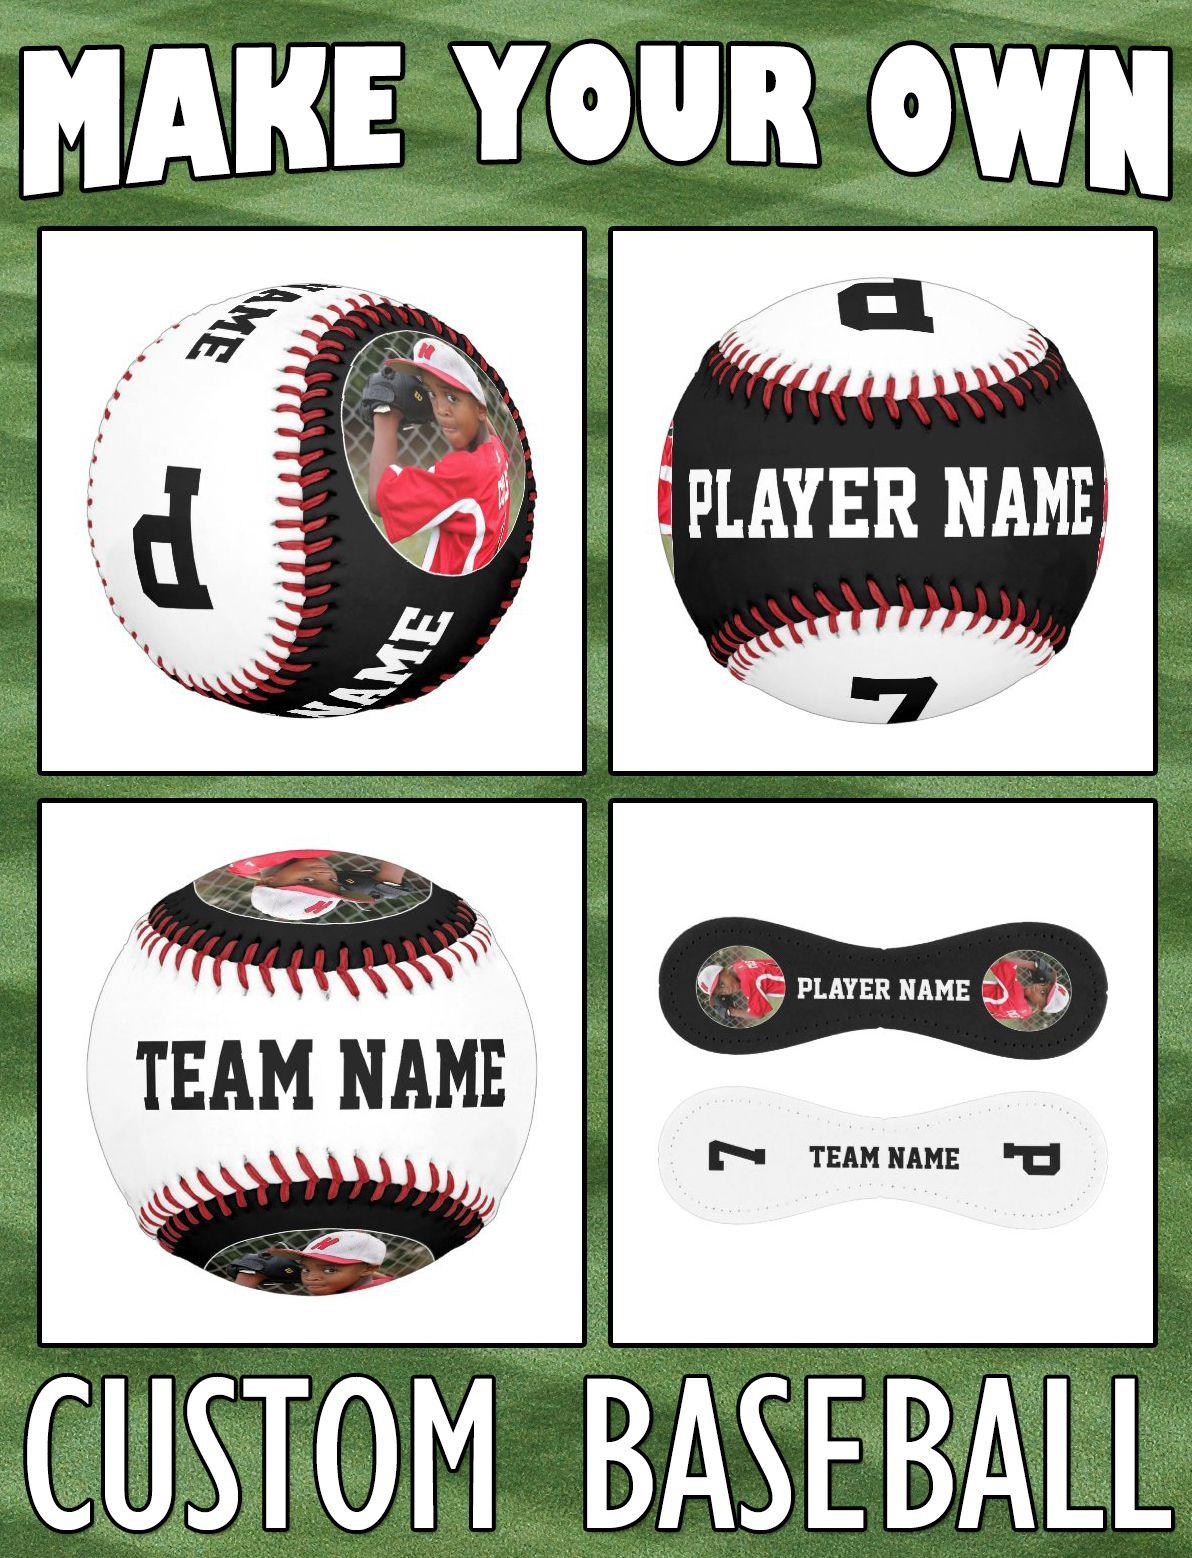 Custom Baseball Team Player Name Photo Number Zazzle Com In 2020 Gifts For Baseball Players Baseball Team Custom Baseballs